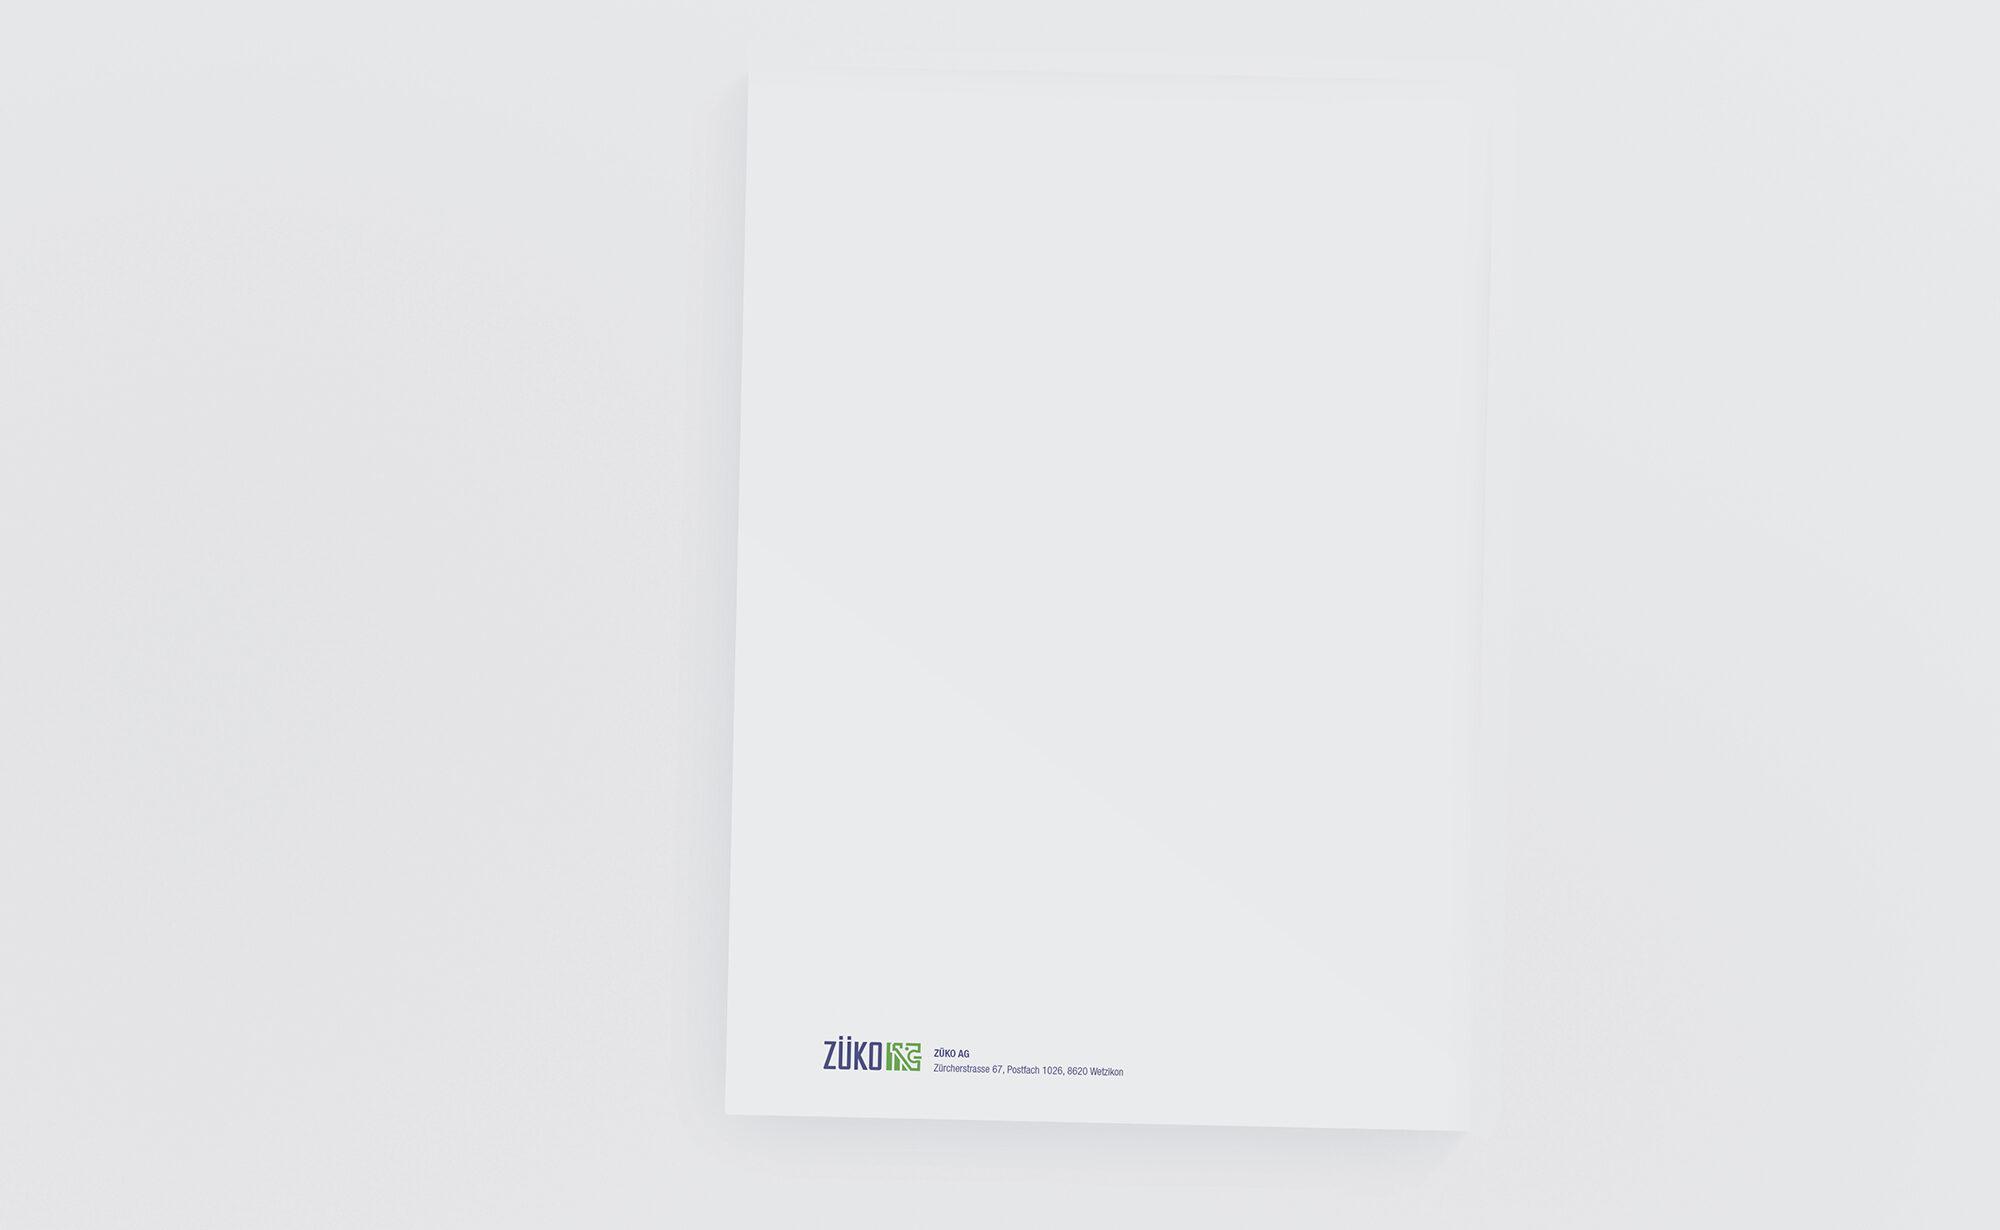 ZÜKO AG Briefpapier, ZÜKO Corporate Design